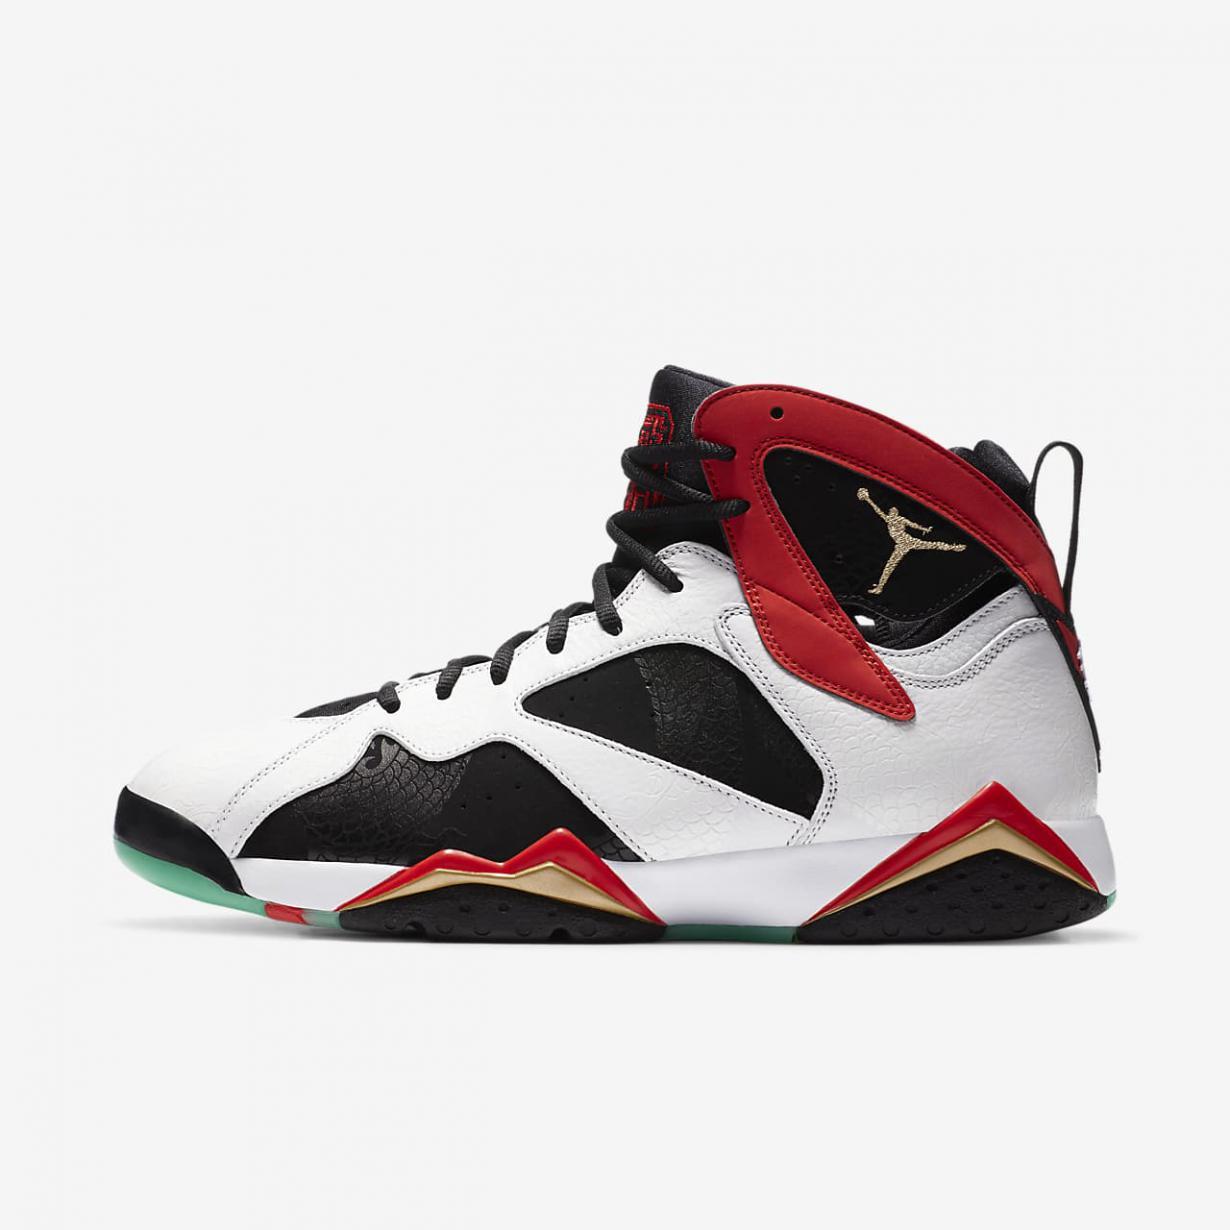 Air Jordan 7 < Nike En Ligne Pas Cher Vente - FR < Gooddaytricities